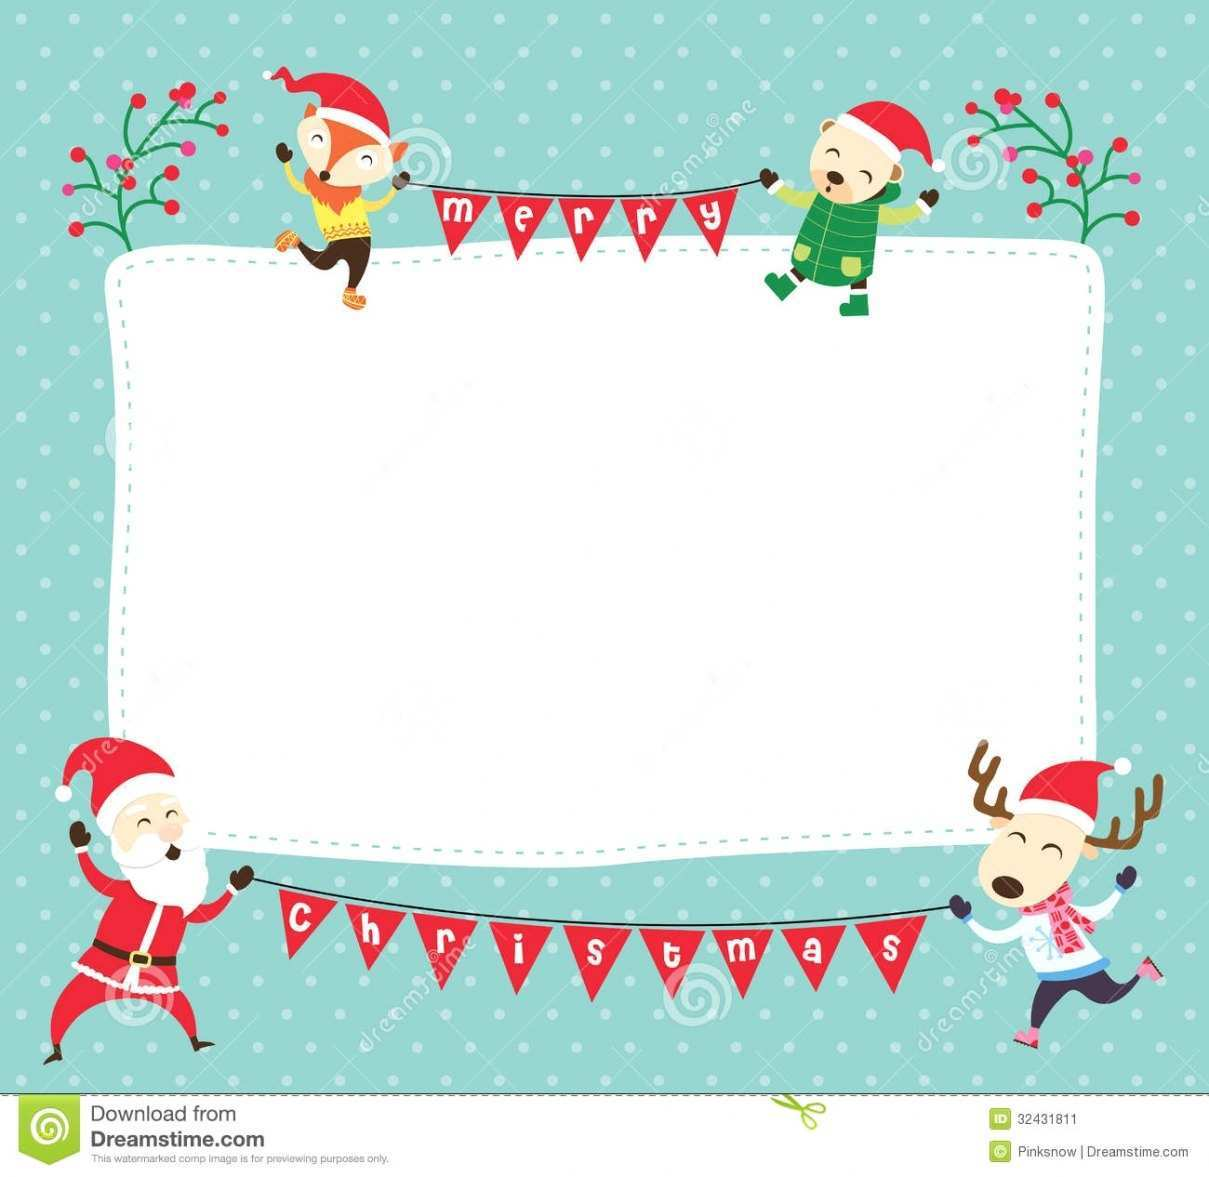 64 Online Microsoft Word Christmas Card Templates in Photoshop for Microsoft Word Christmas Card Templates